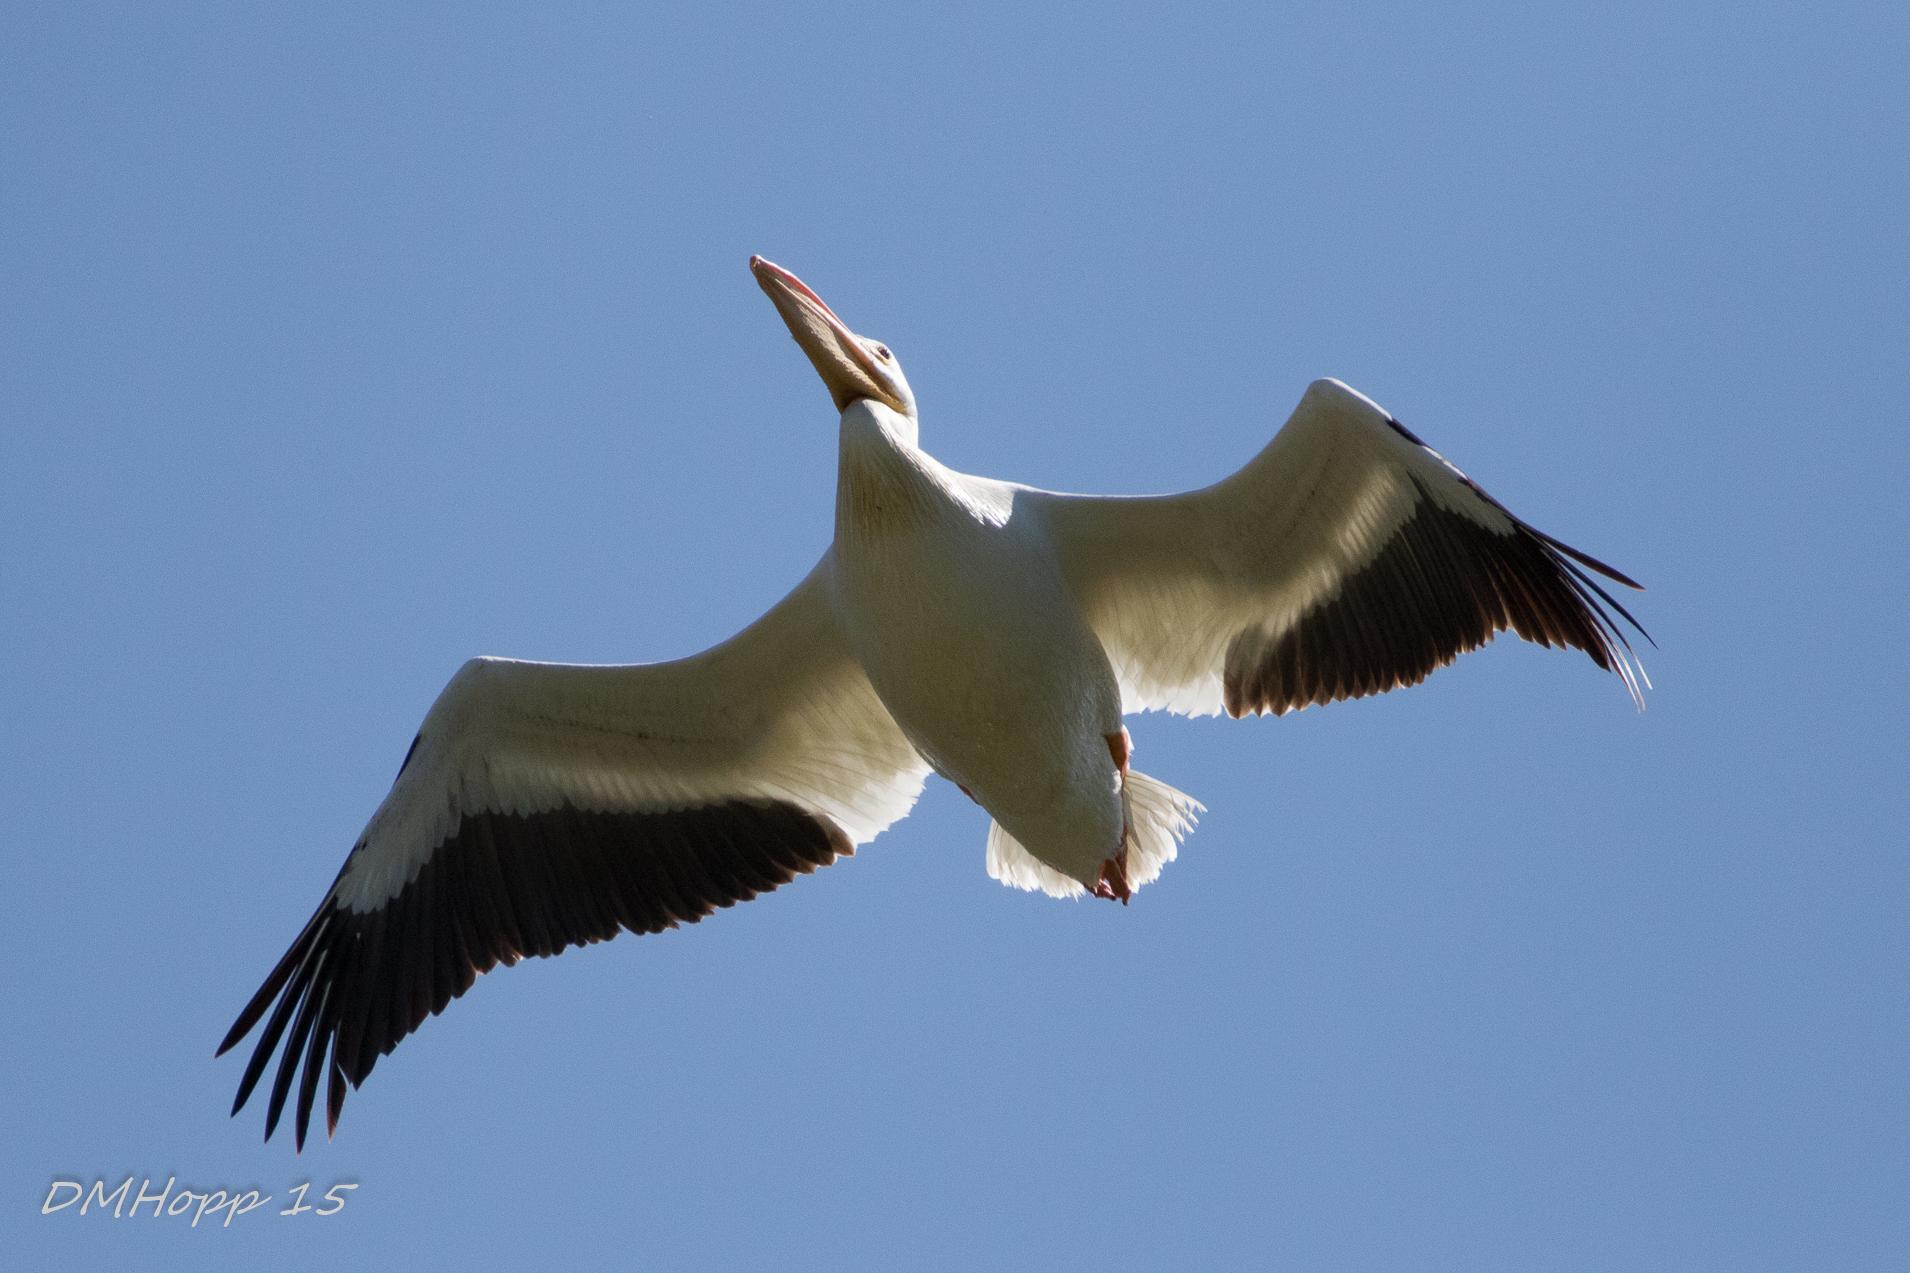 Flying Pelican - DMHopp